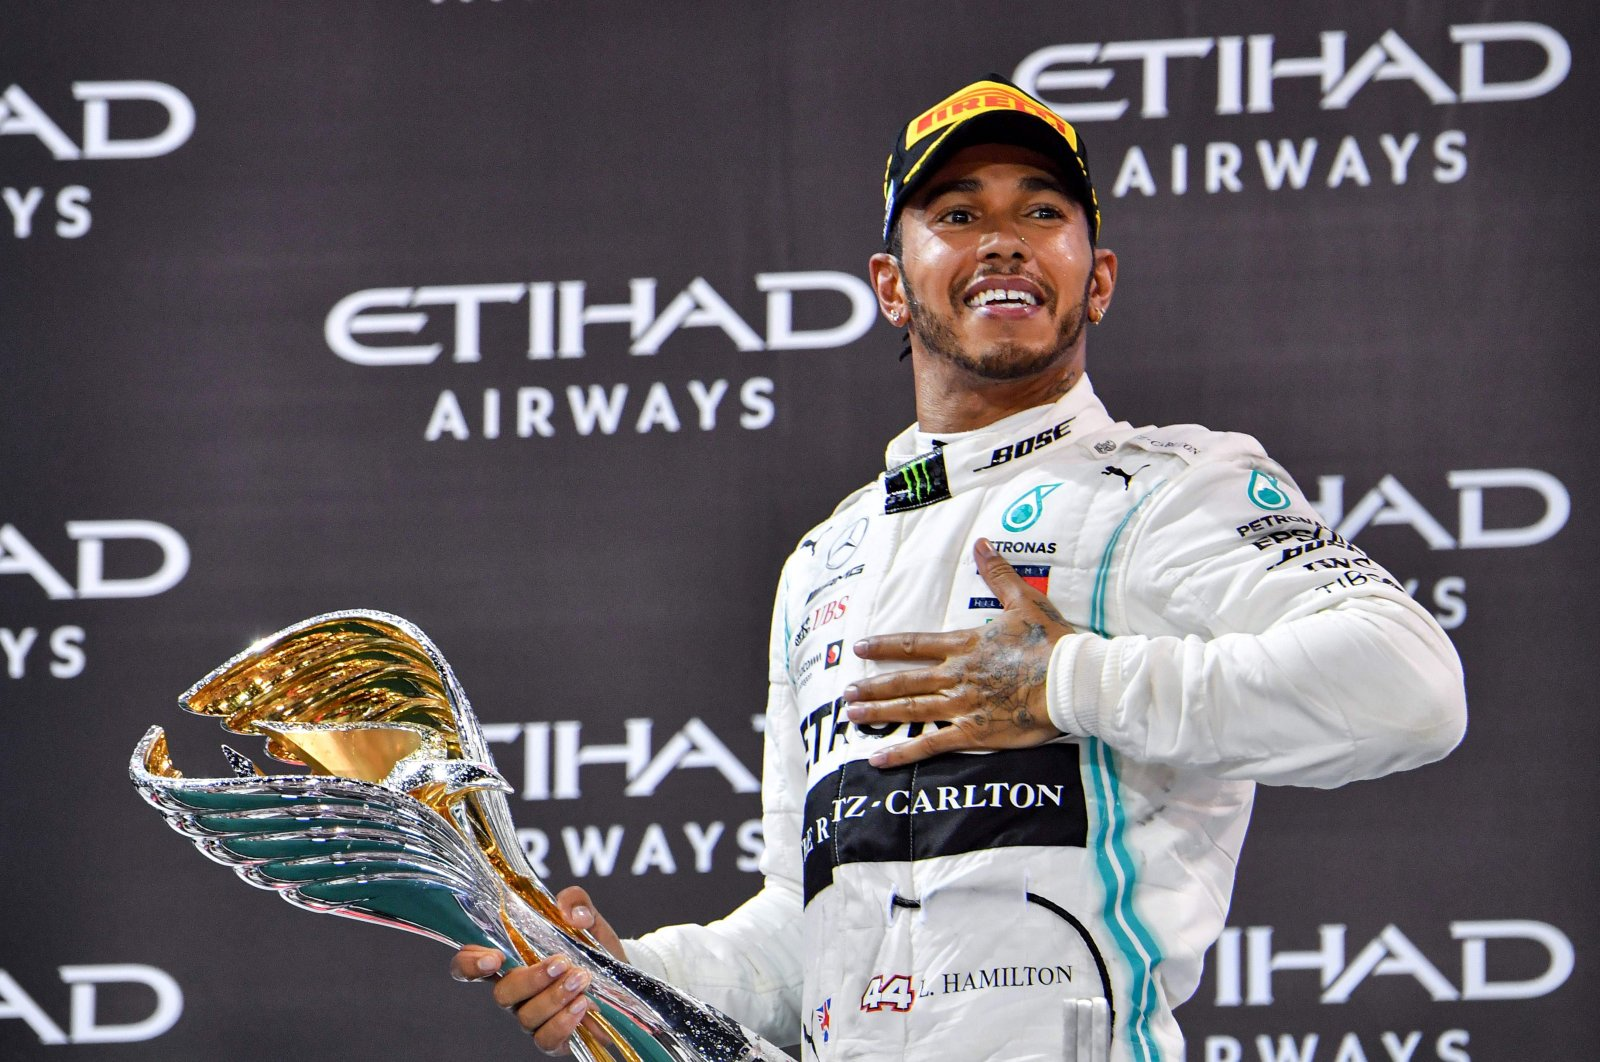 Despite taking every pole position at Albert Park Circuit since 2014, Hamilton won just once at Australian Grand Prix. (AFP Photo)